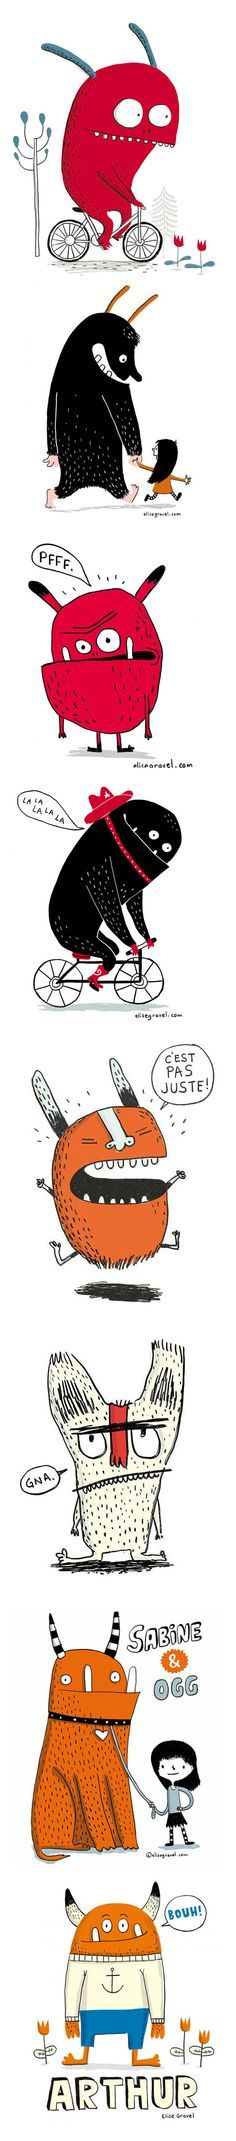 Elise Gravel • Monsters • Illustration • Characters • cute • orange • red • kids